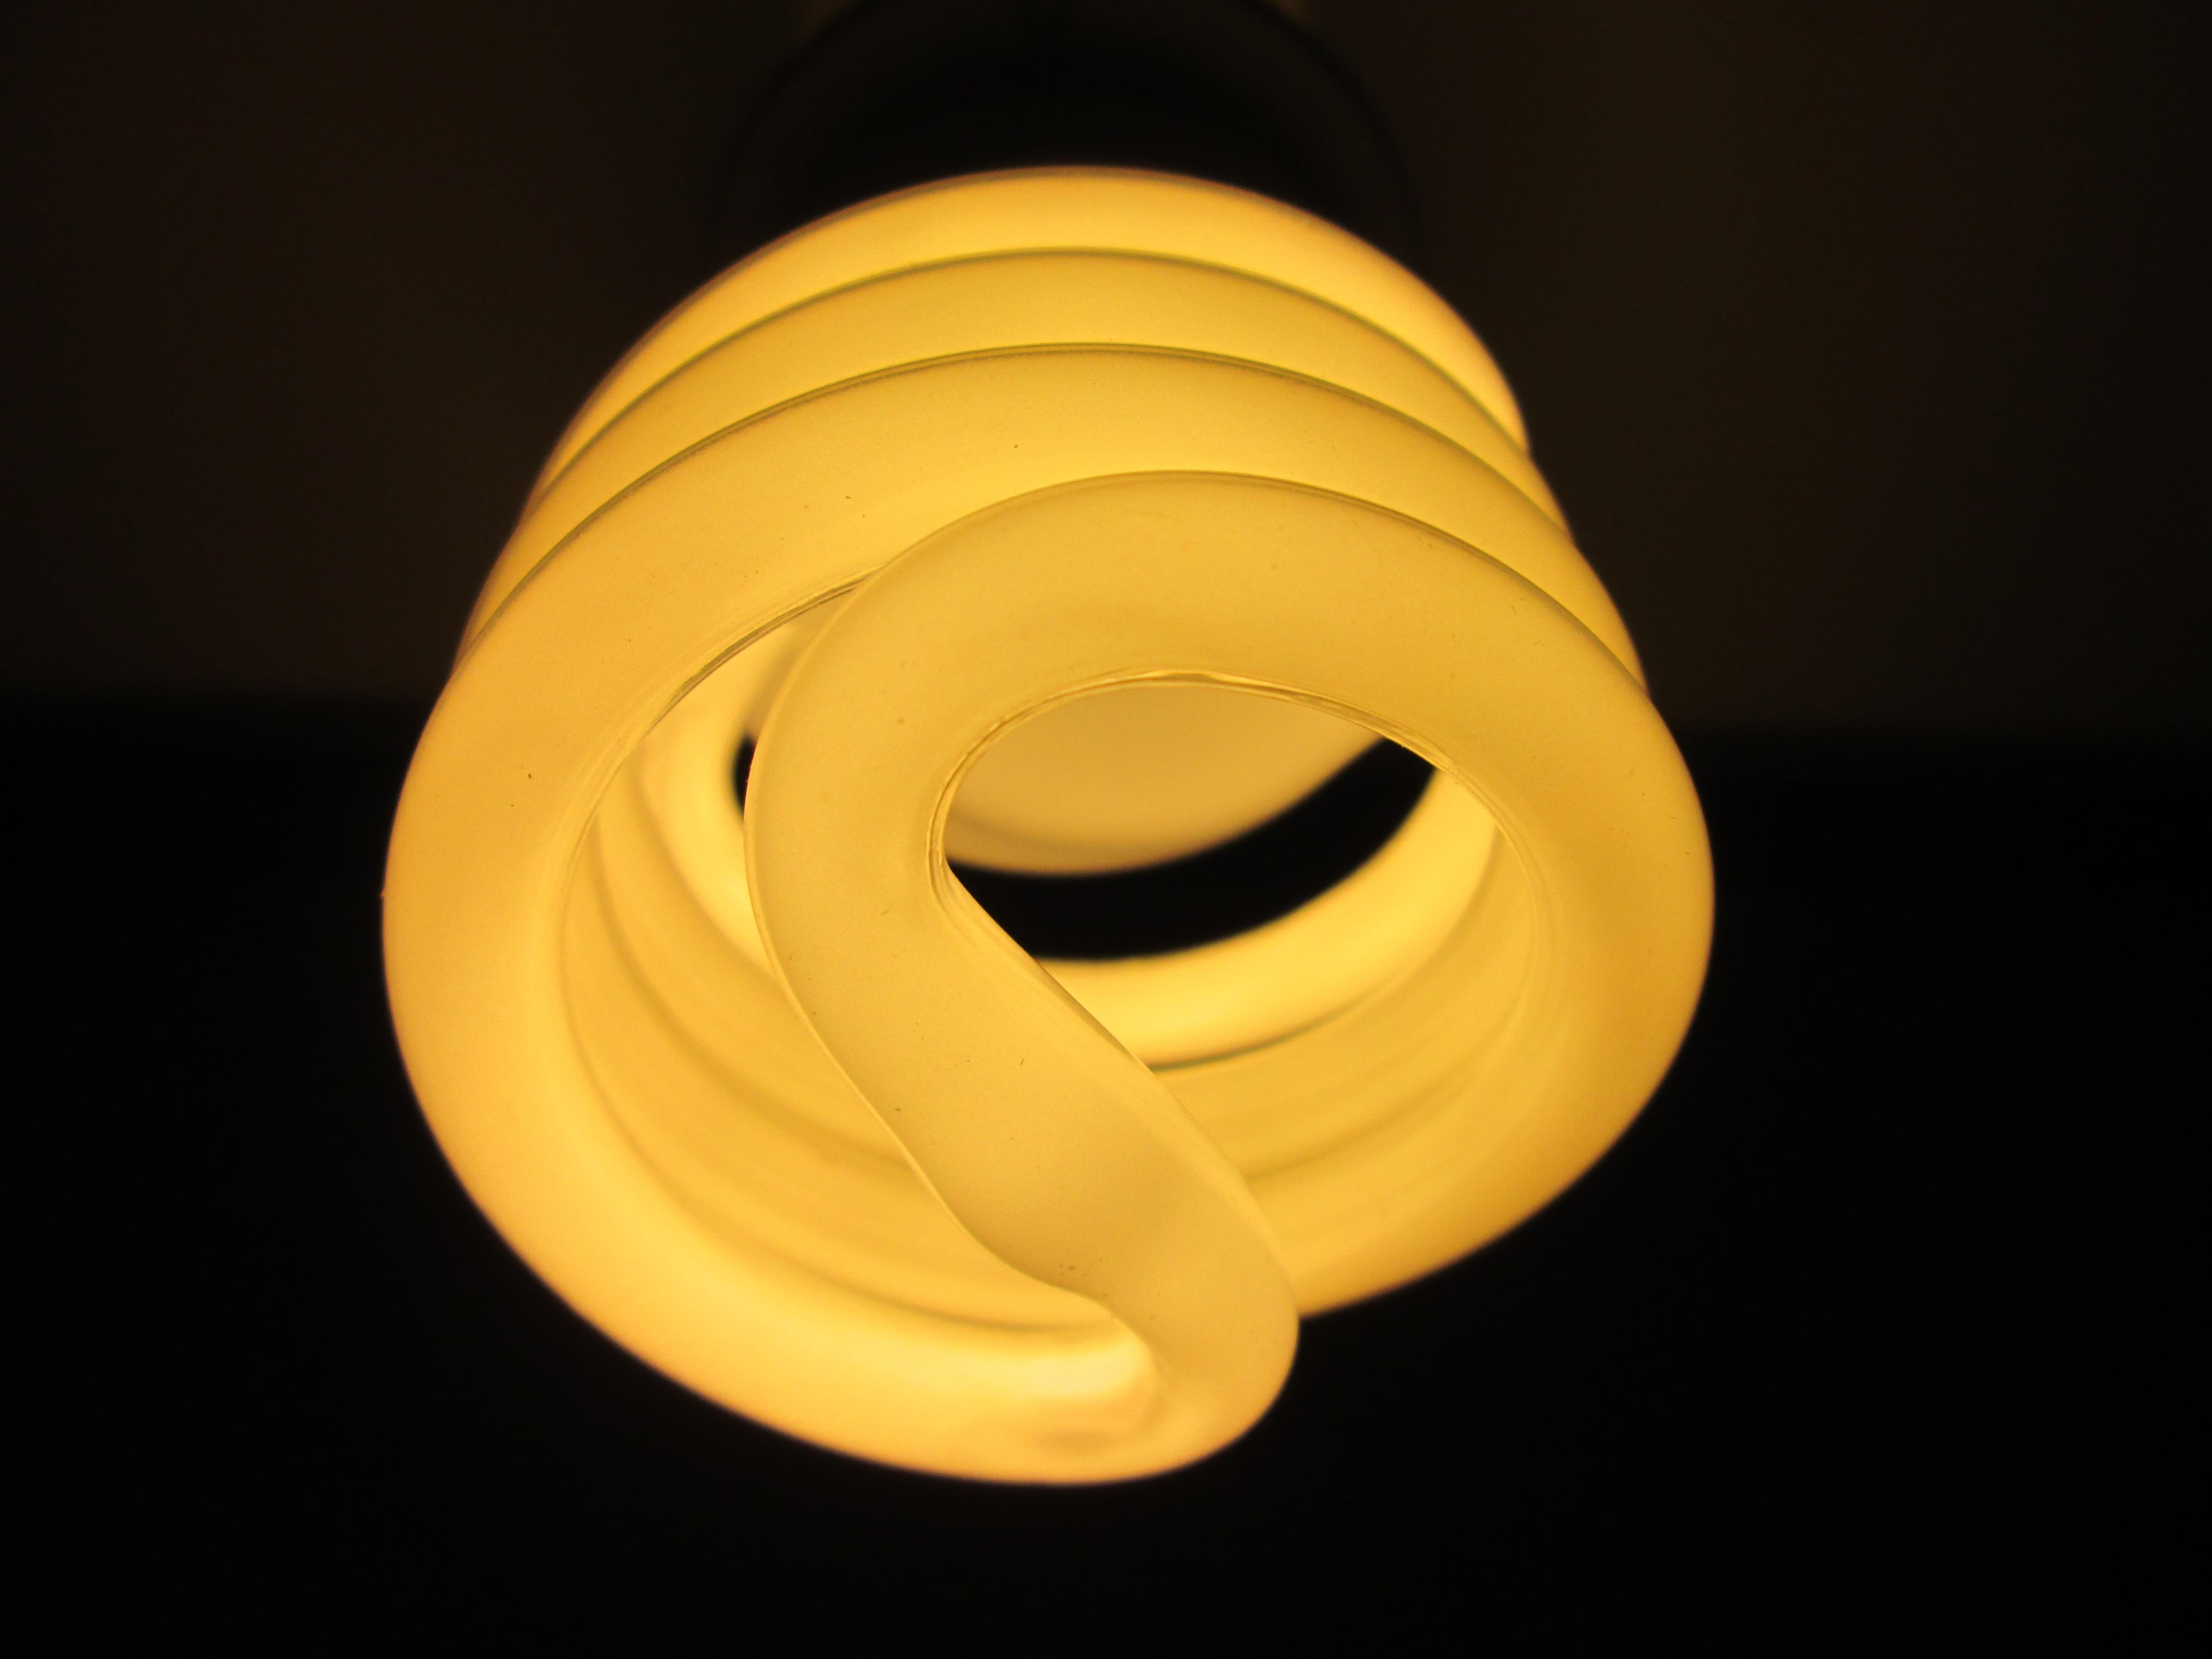 Free Images : spiral, number, ear, yellow, lighting, circle ...